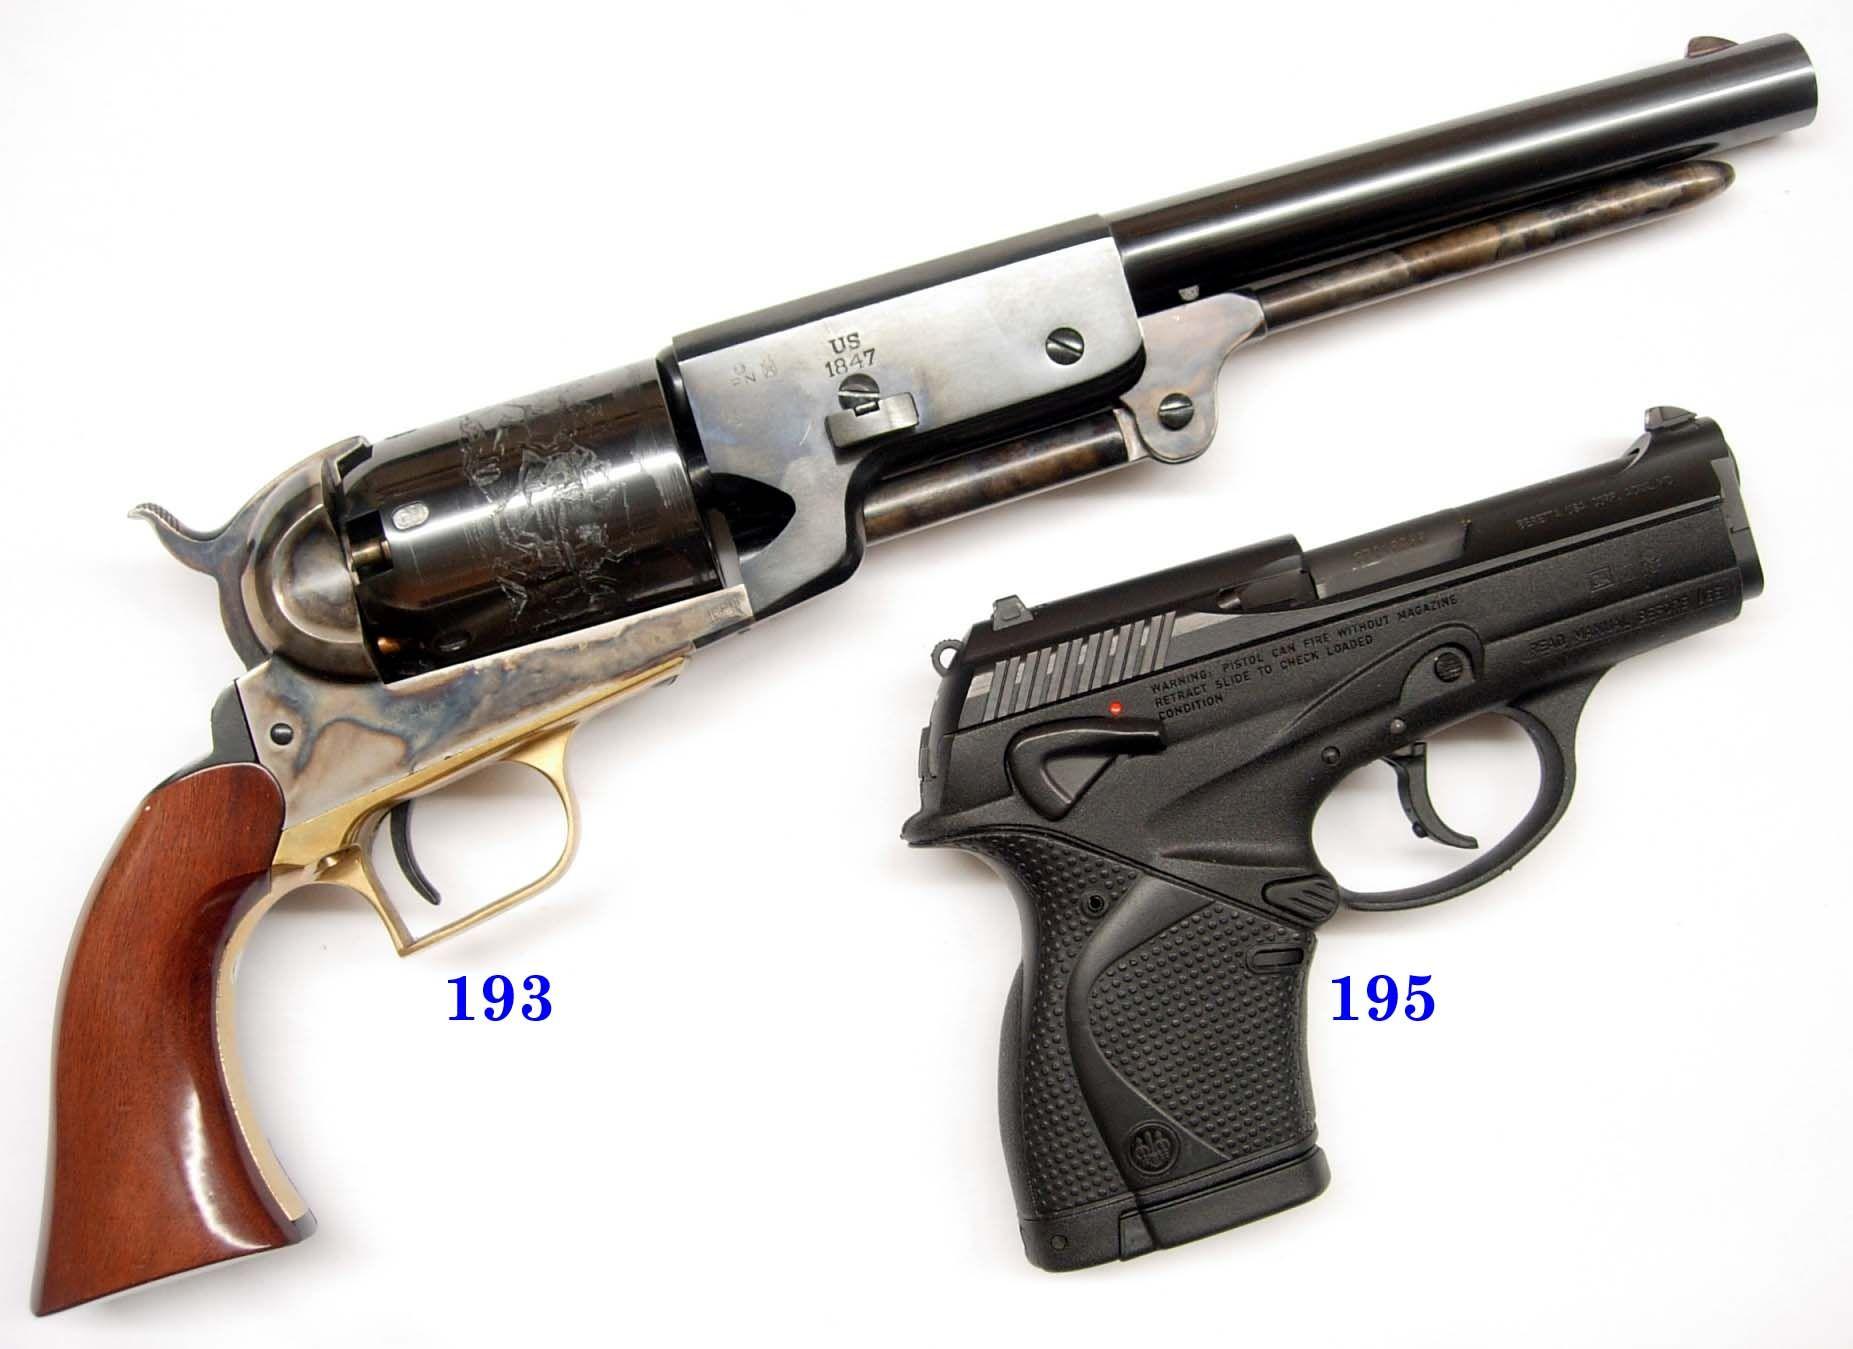 1847 Colt Walker Revolver & pea shooter   Bang 4 (1397 pins